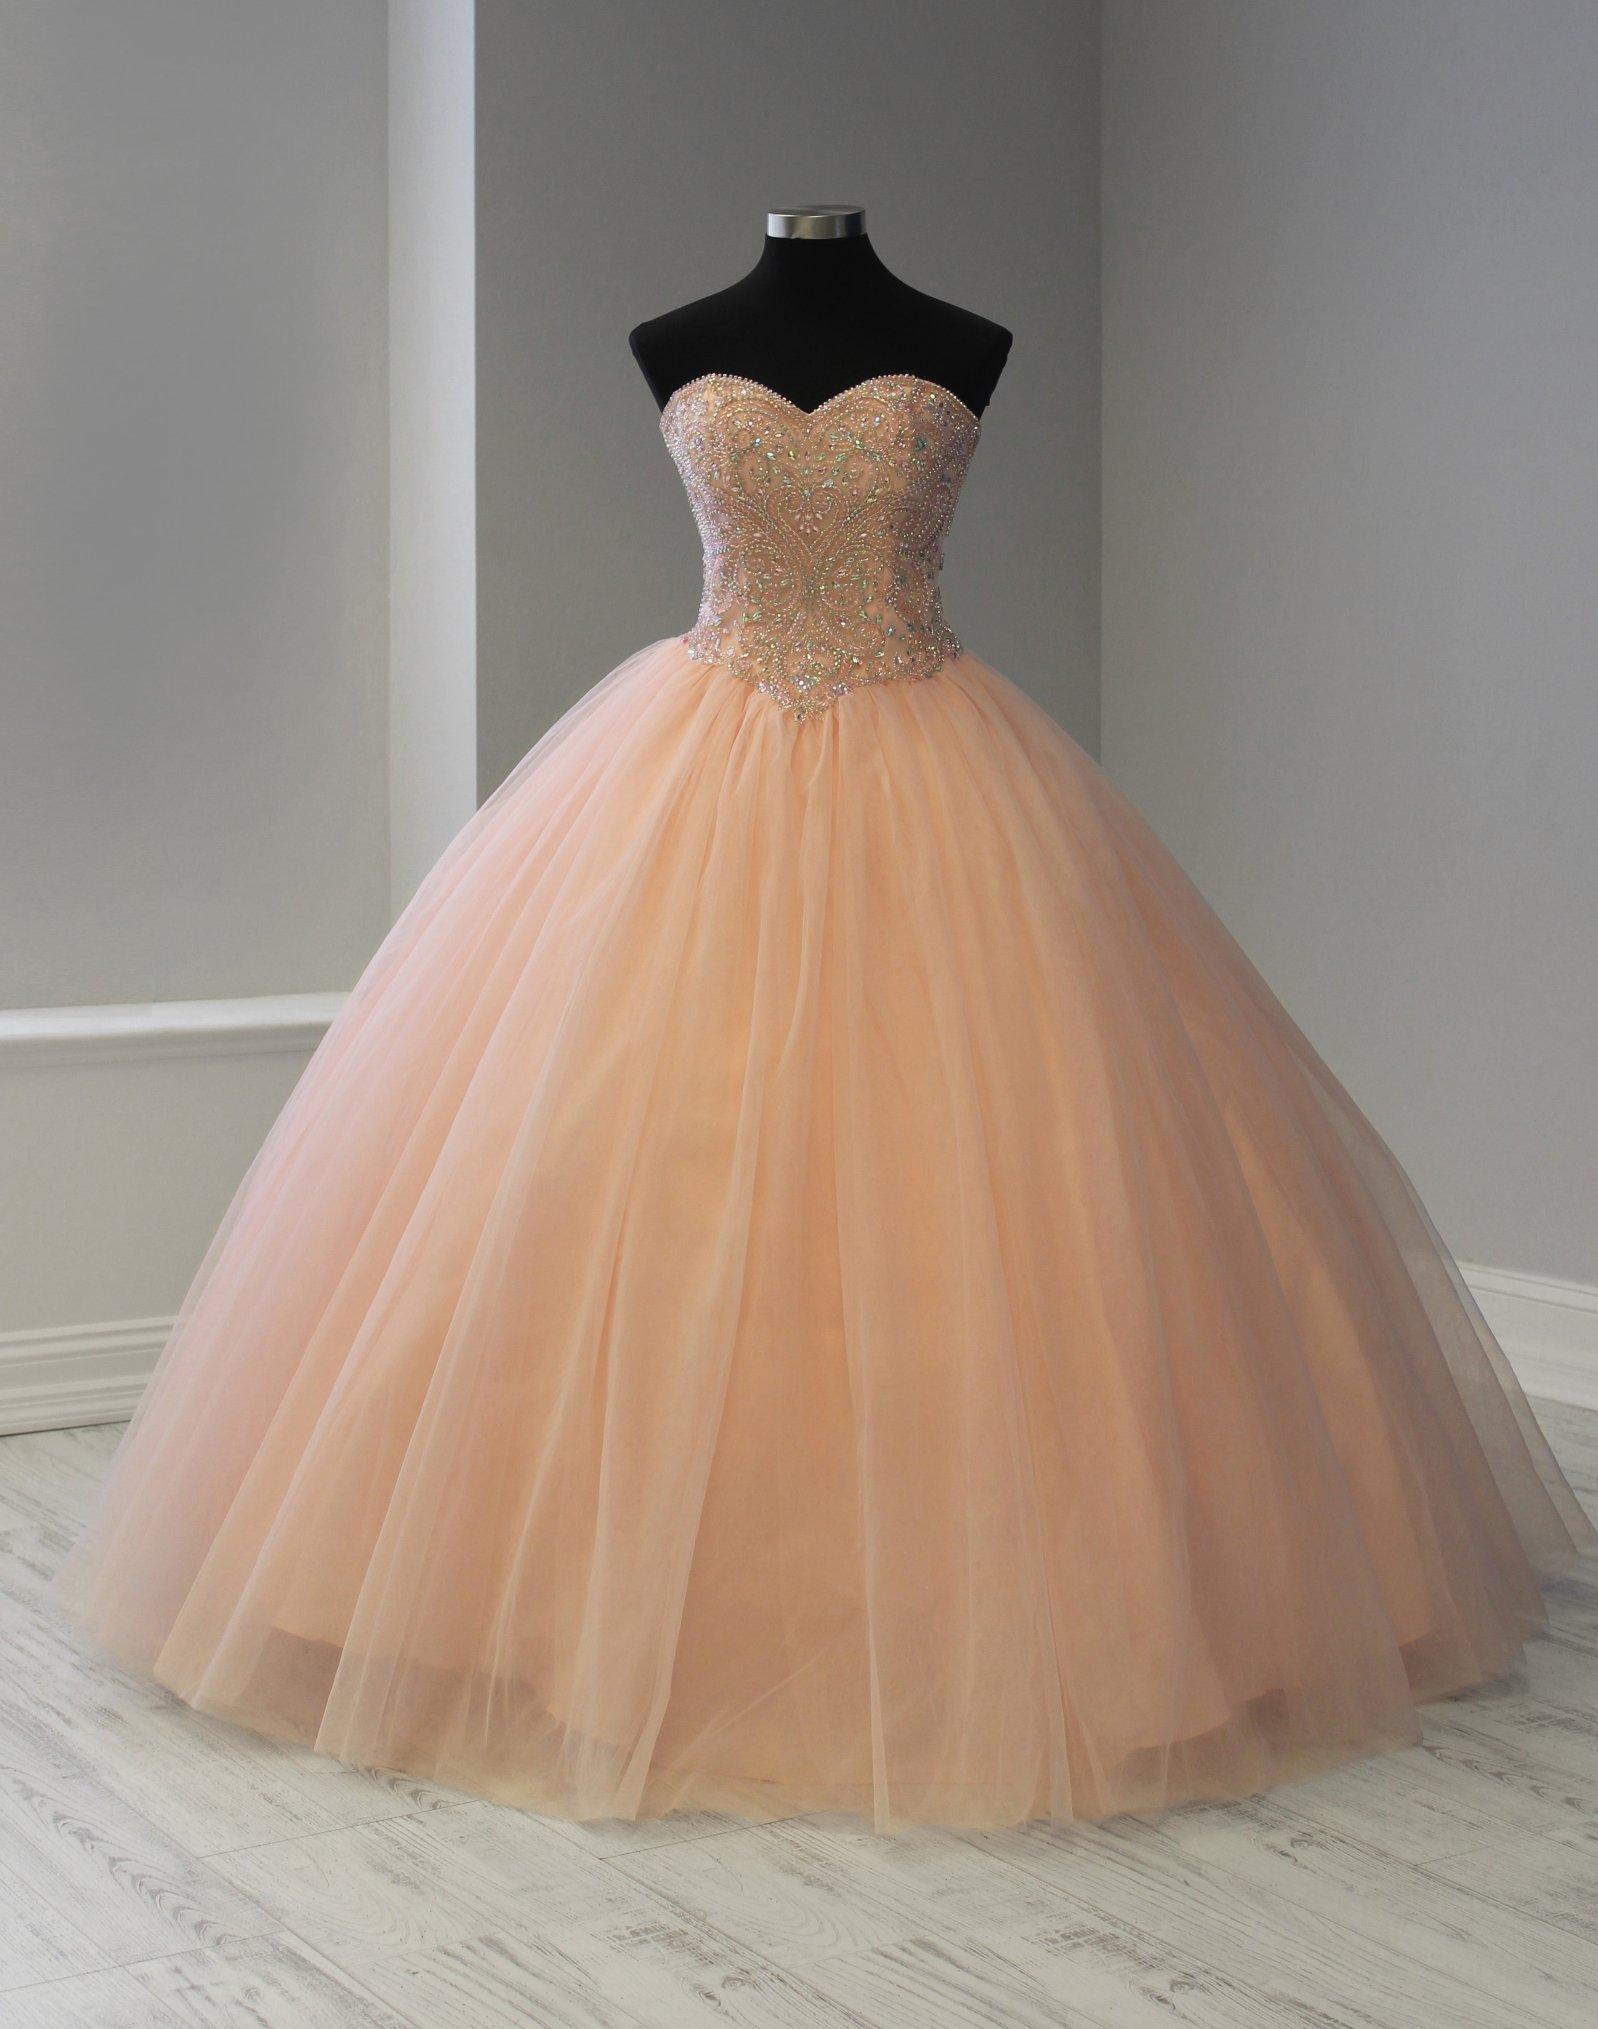 Strapless Sweetheart Quinceanera Dress by Fiesta Gowns 56366 -   19 dress Quinceanera gold ideas